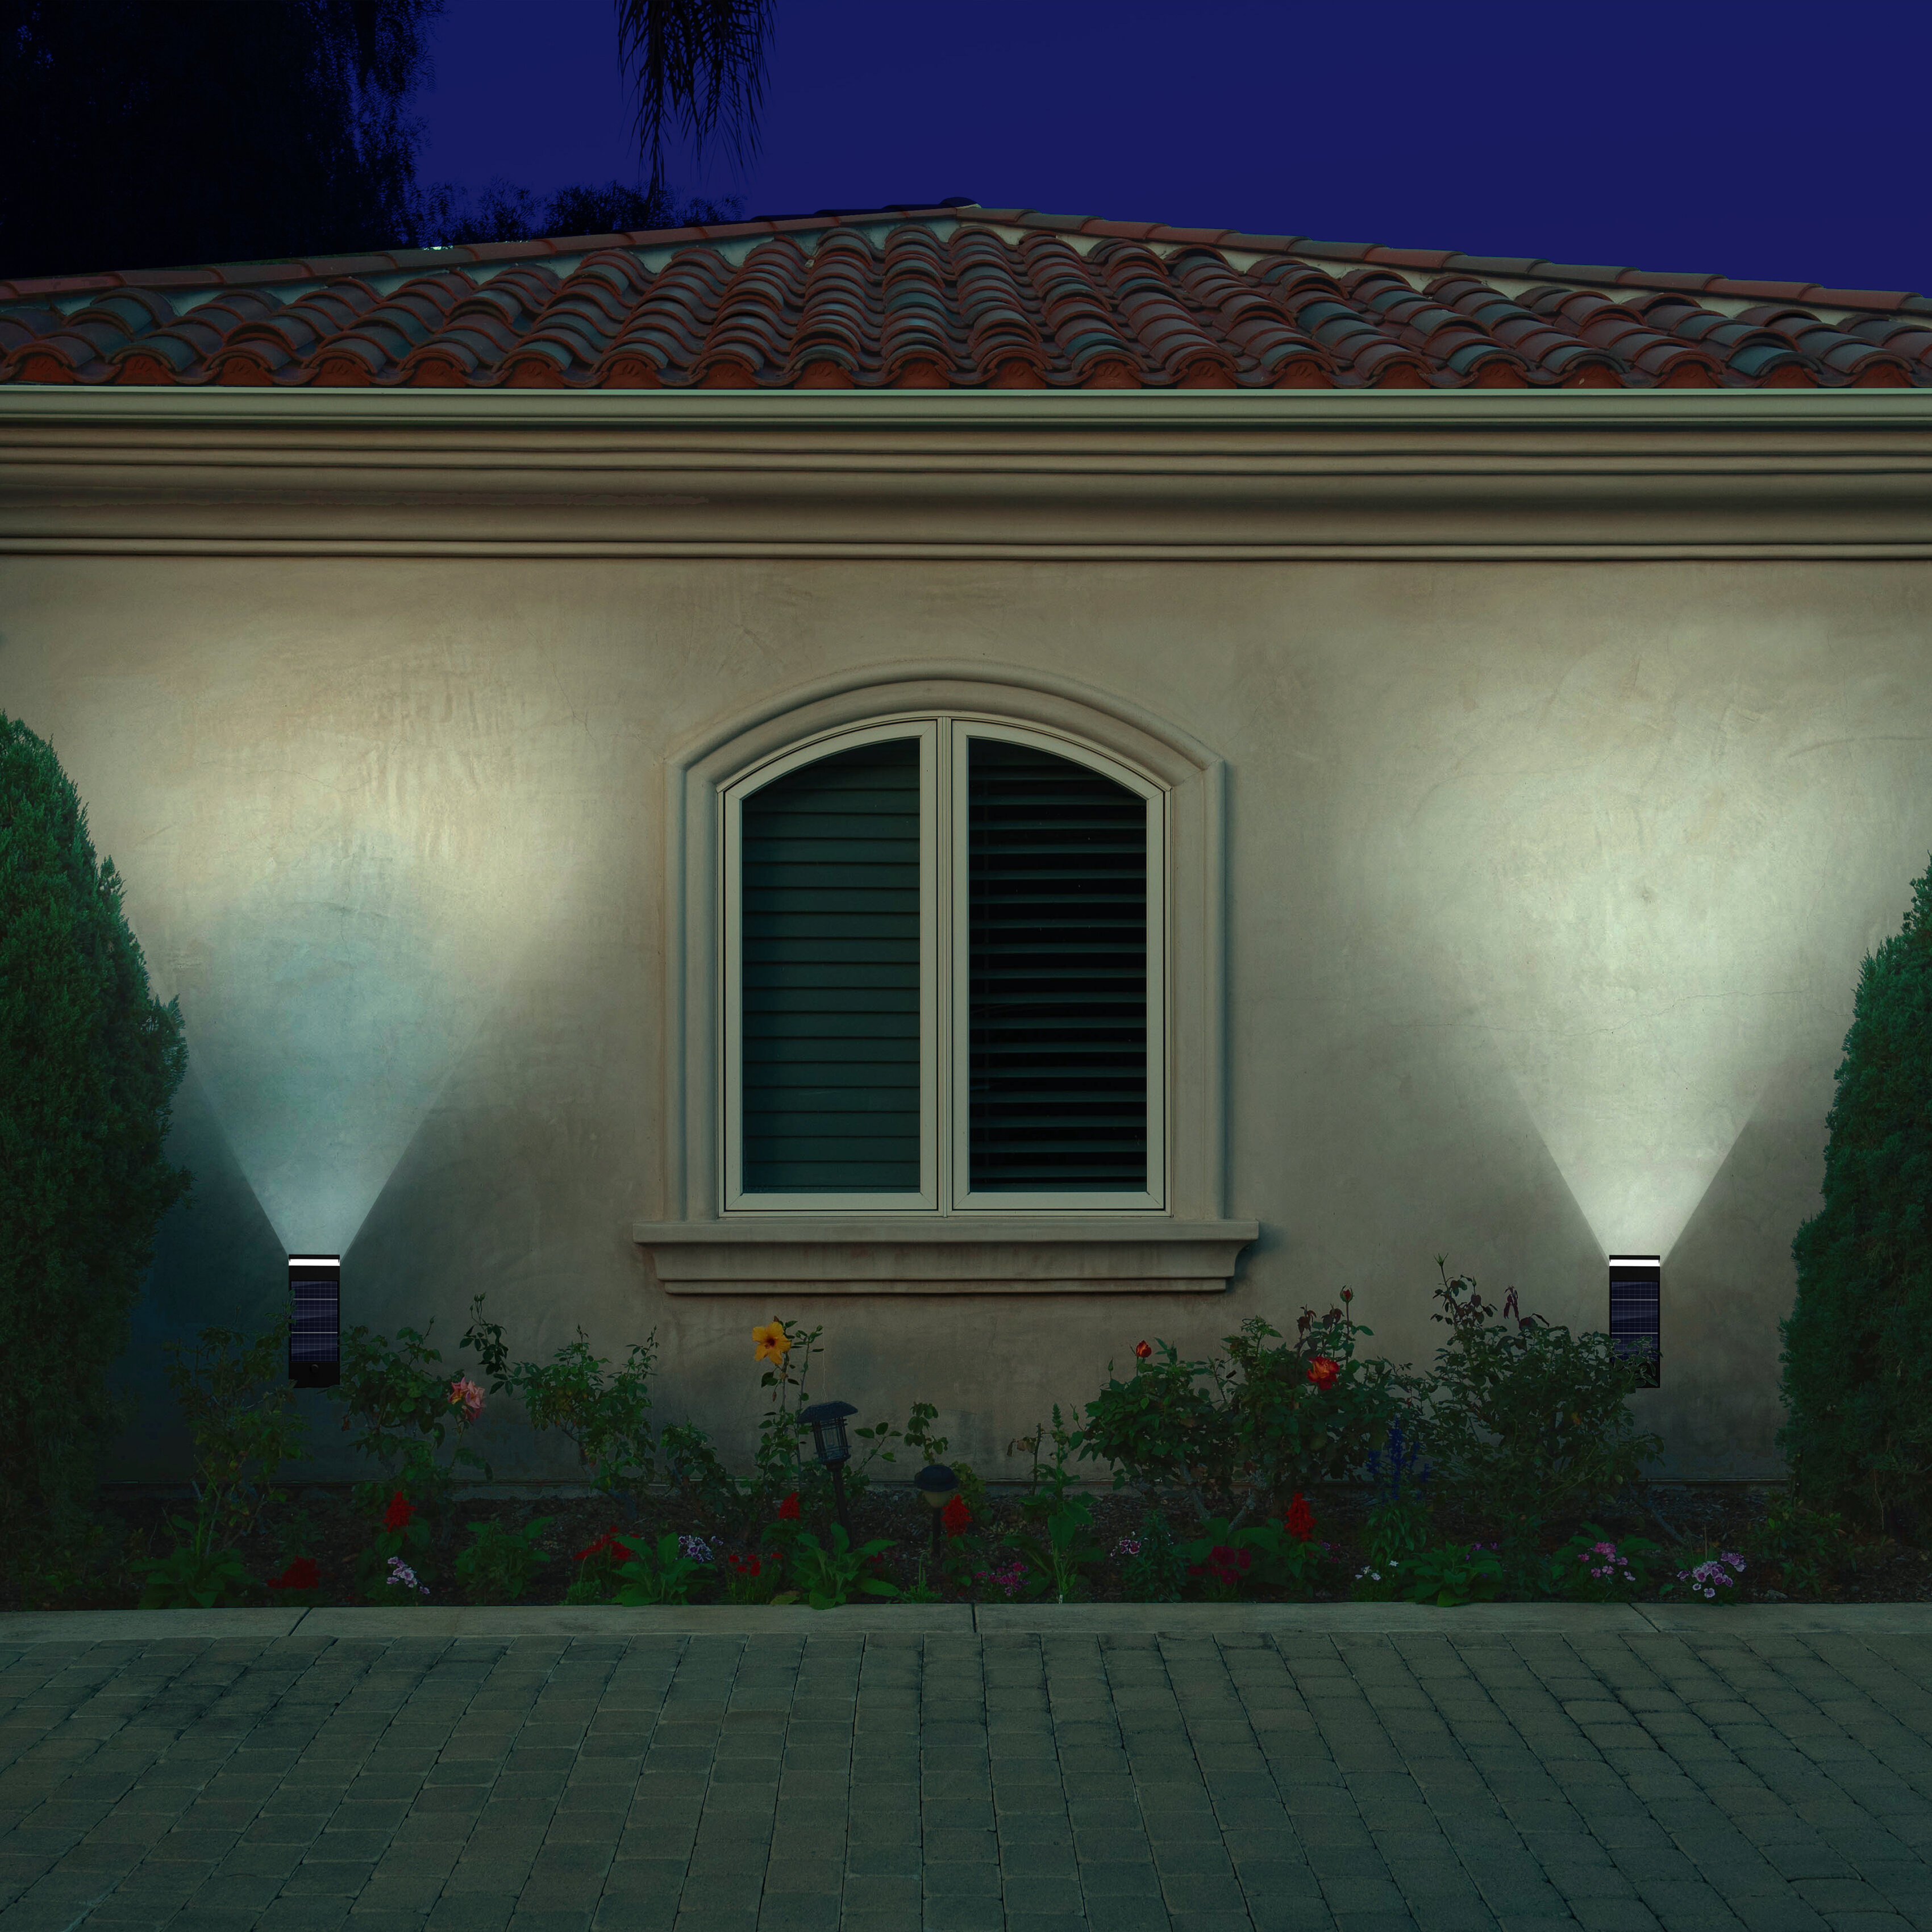 Williston Forge Verlin Led Outdoor Bulkhead Light Reviews Wayfair